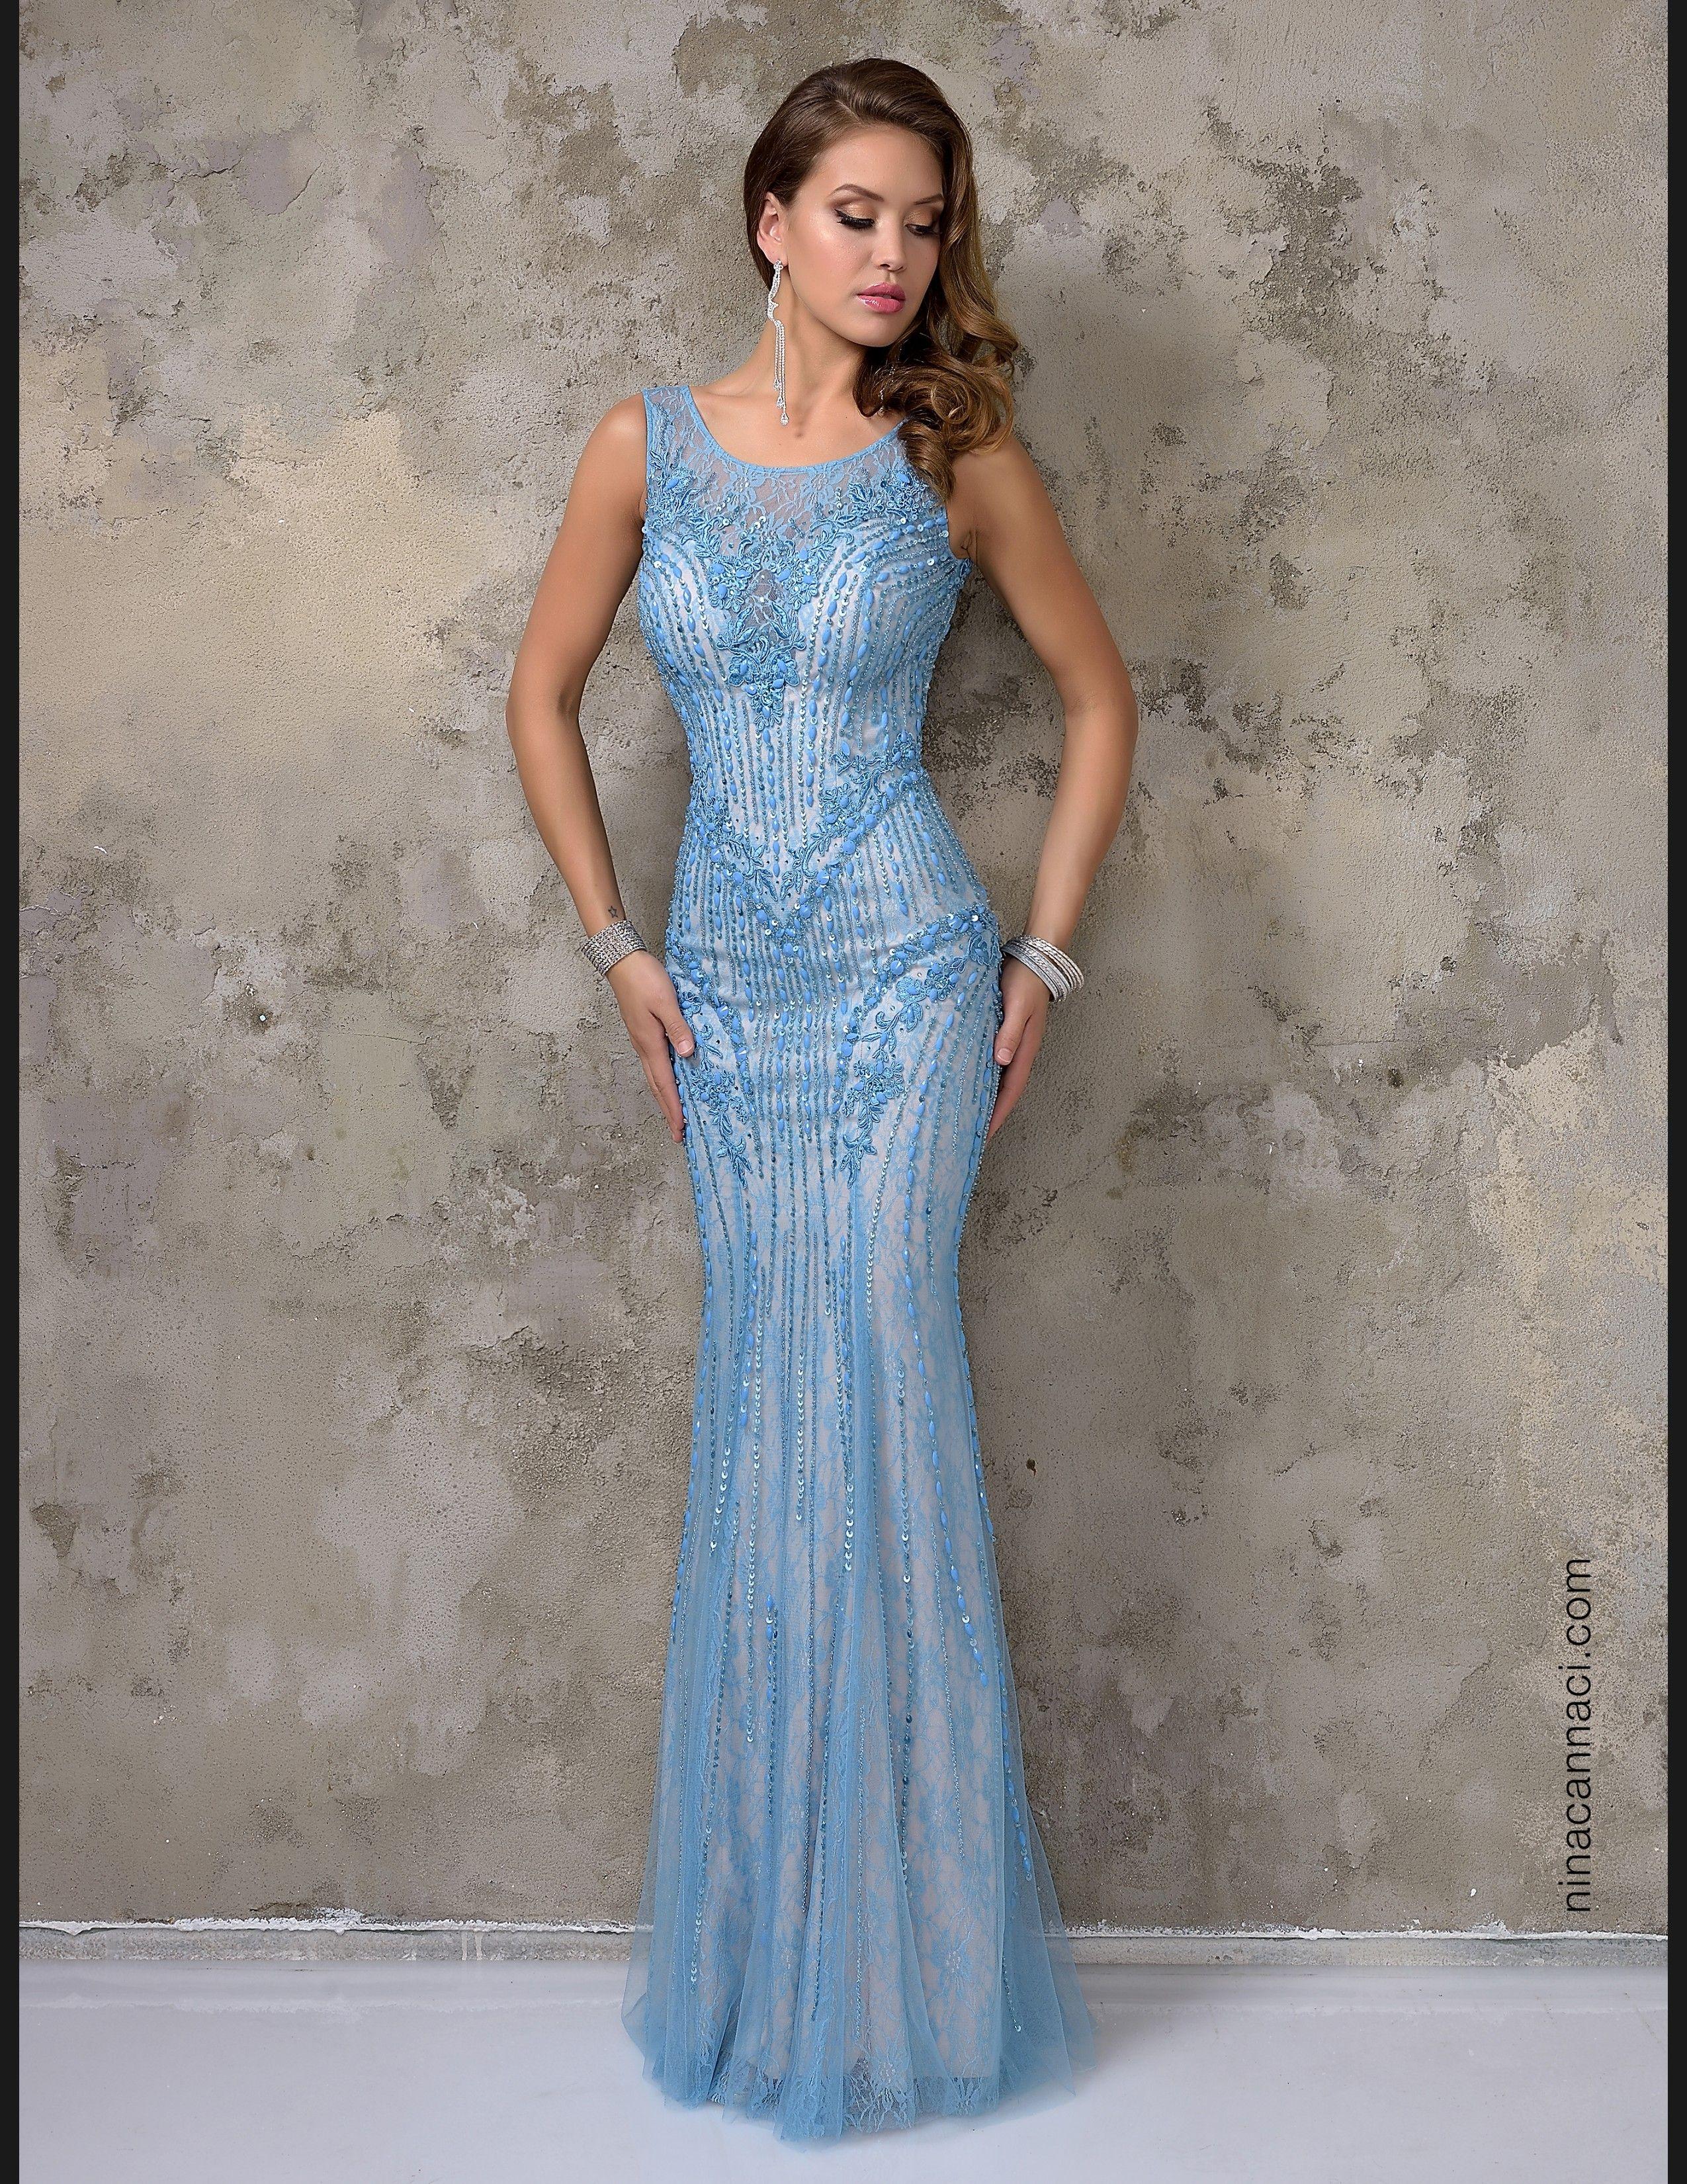 Nina Prom 2016! http://justgirlstuff.com/sleek/ | Sleek Prom Dresses ...